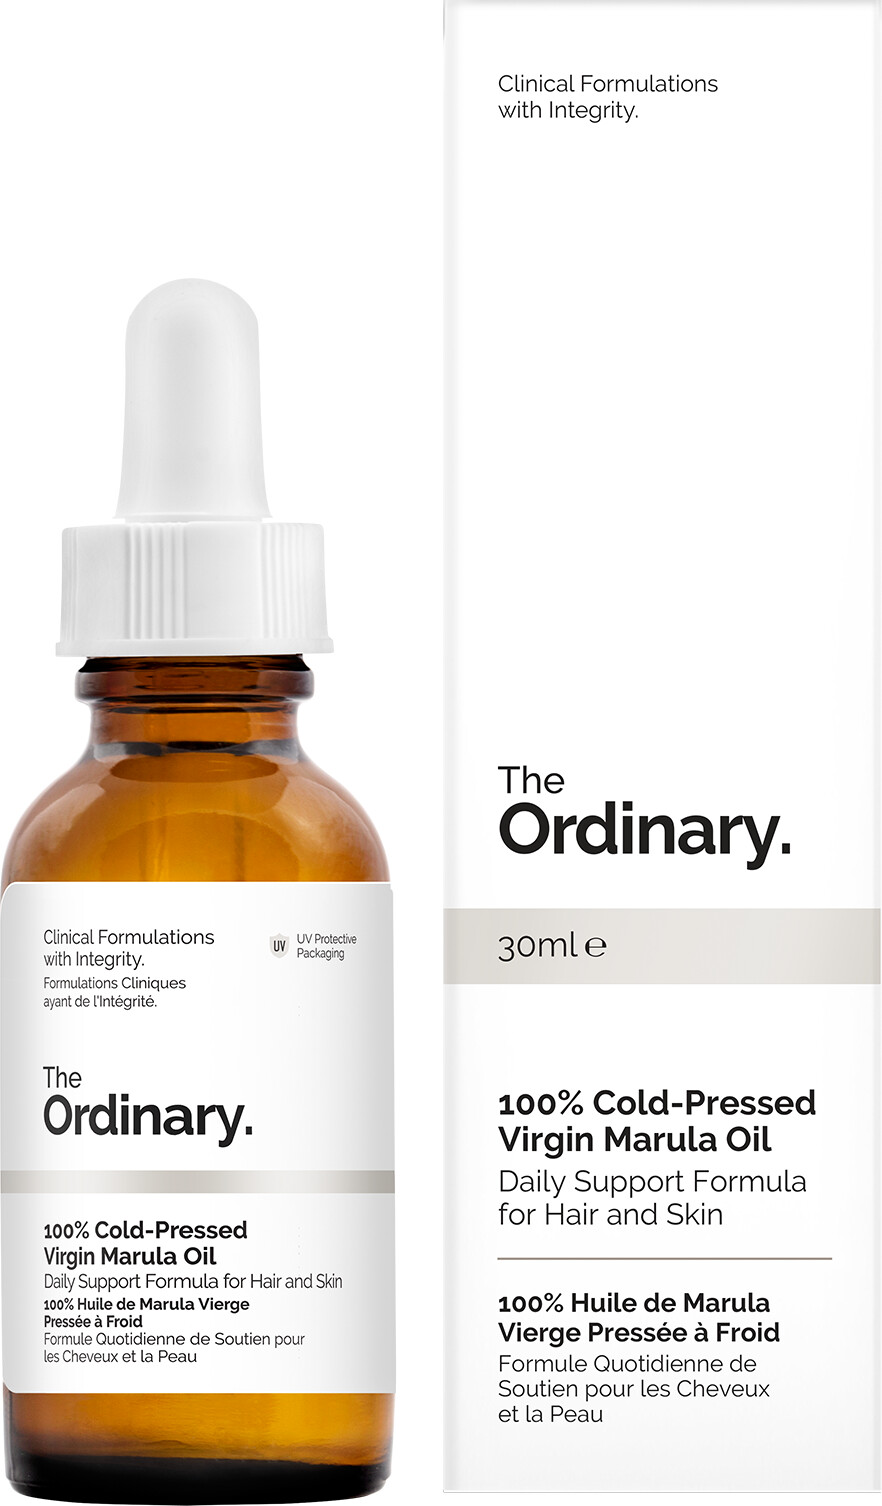 the-ordinary-100_-cold-pressed-virgin-ma